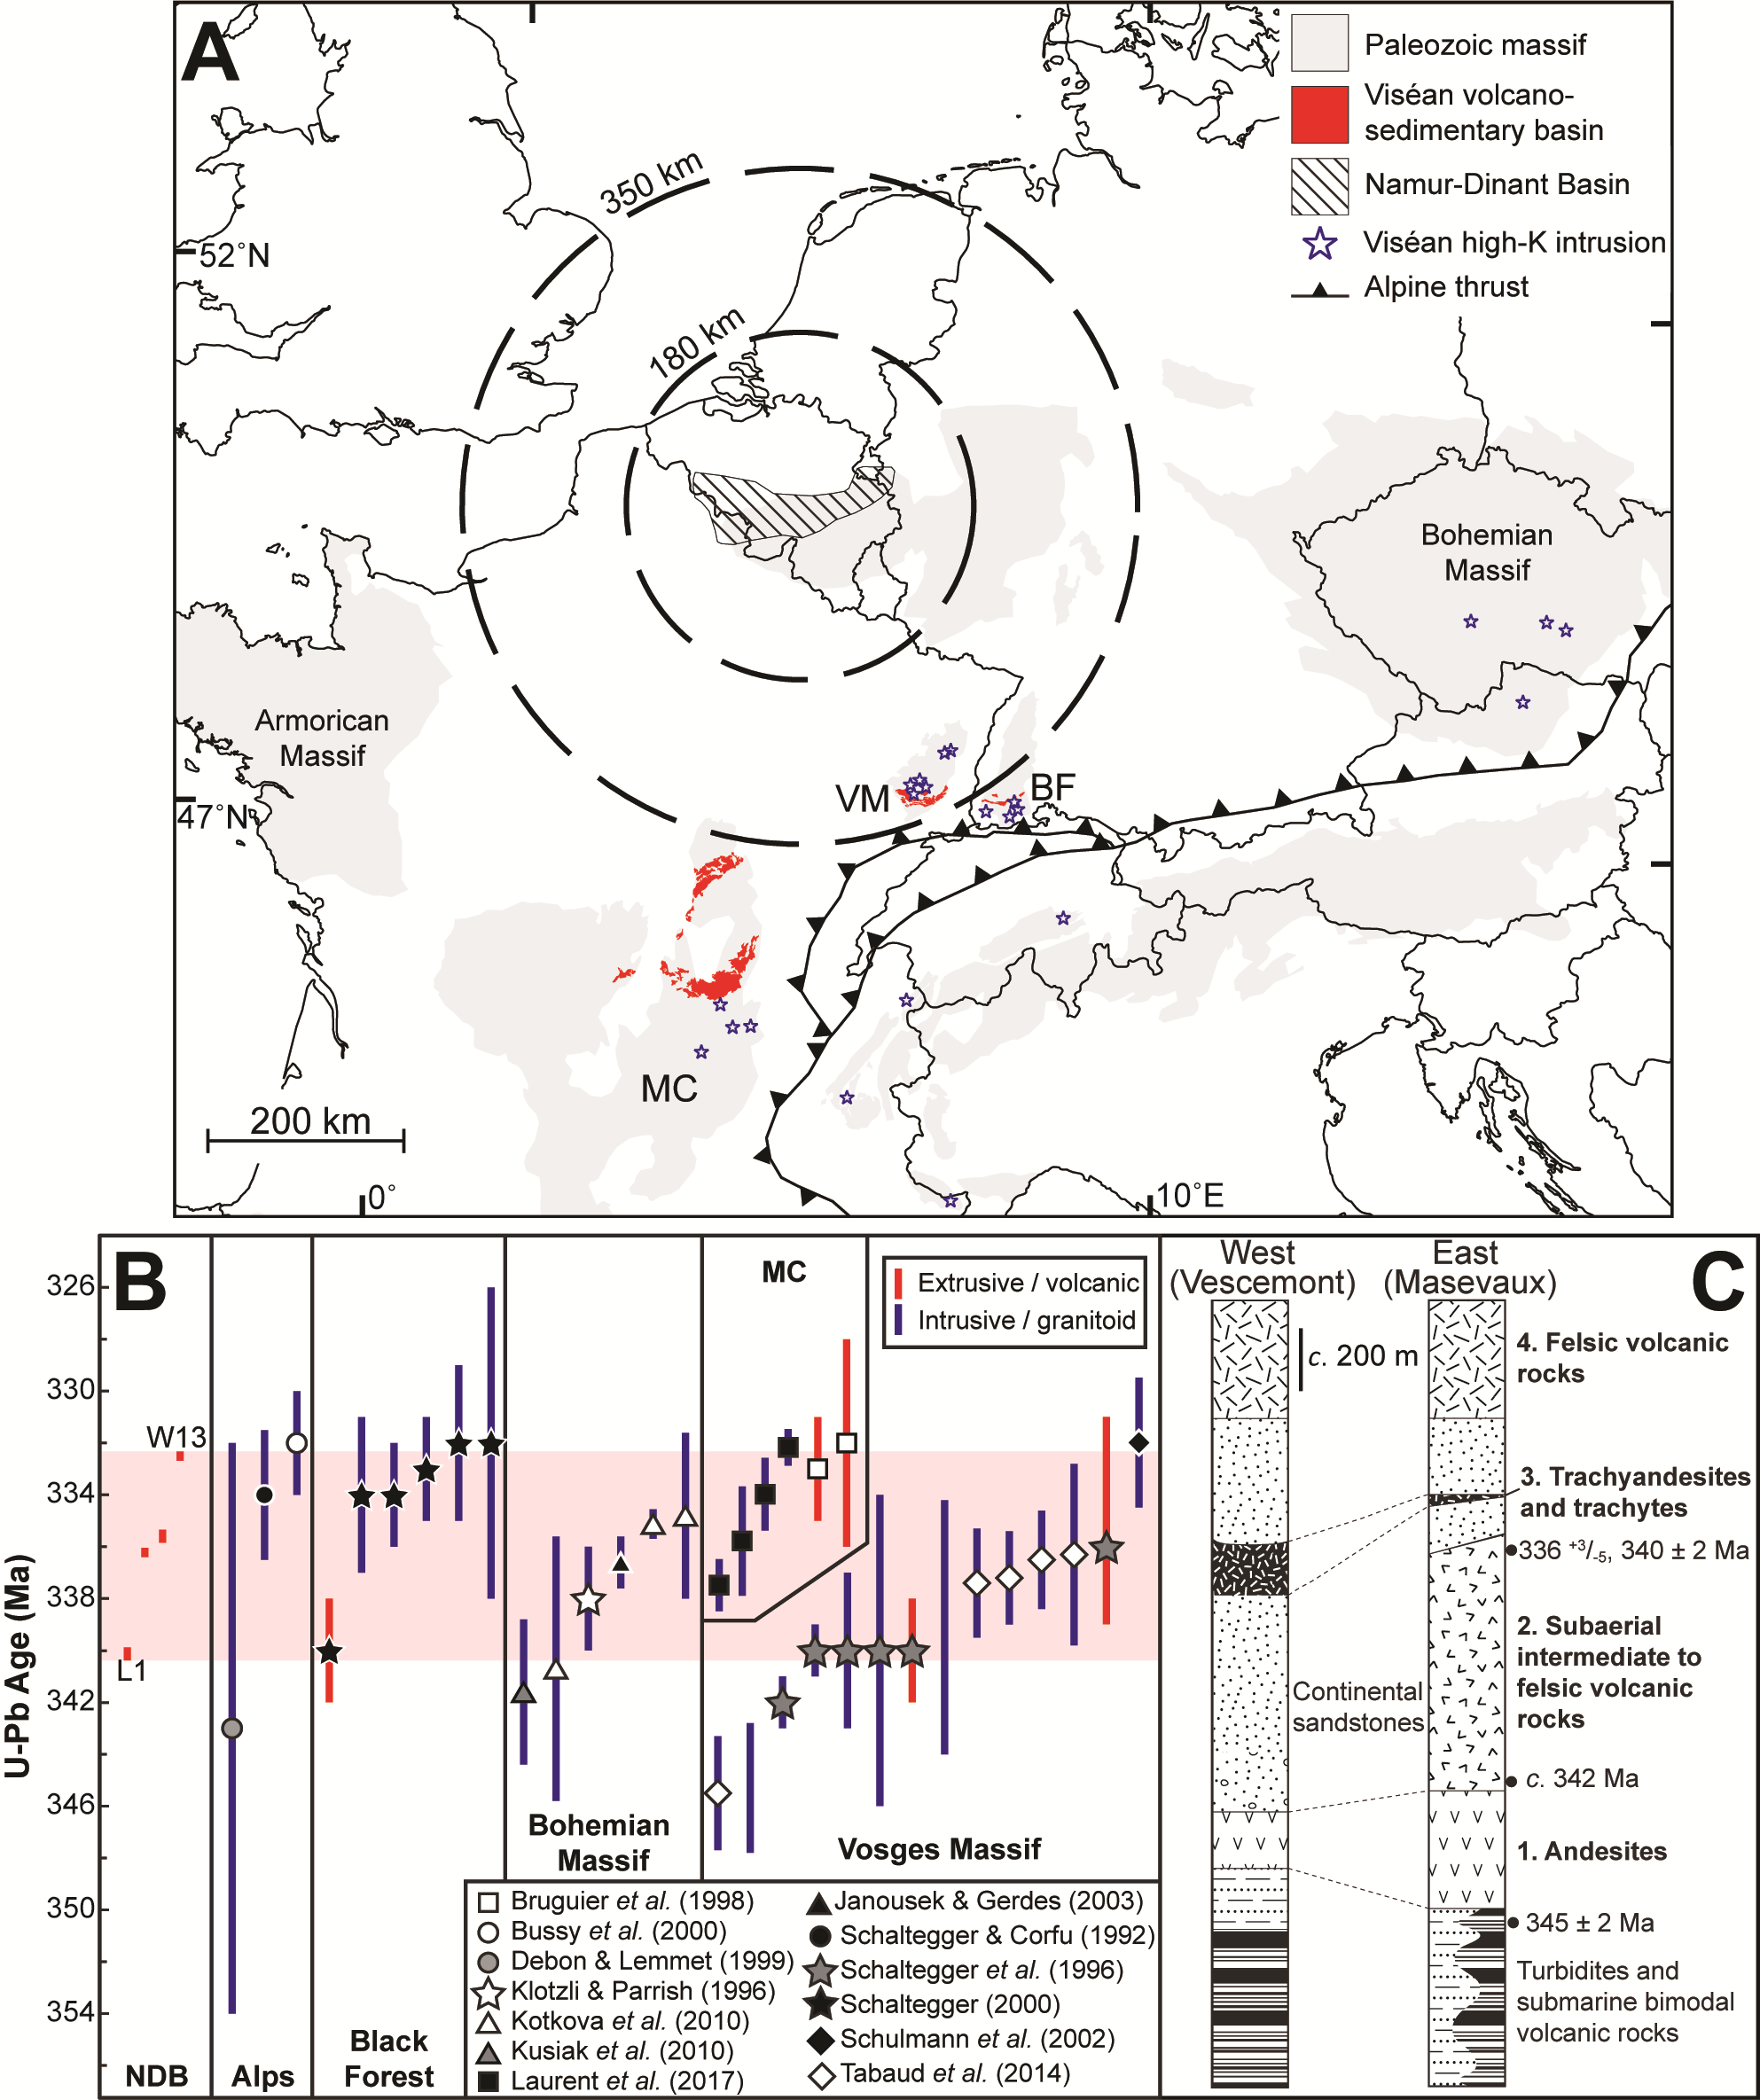 Geochemistry And Origin Of Carboniferous Mississippian Visan Millermatic 350p Wiring Diagram 38figure 9 A Map Europe Showing The Location Namur Dinant Basin Estimated Maximum Ash Transport Distances Based On Zircon Grain